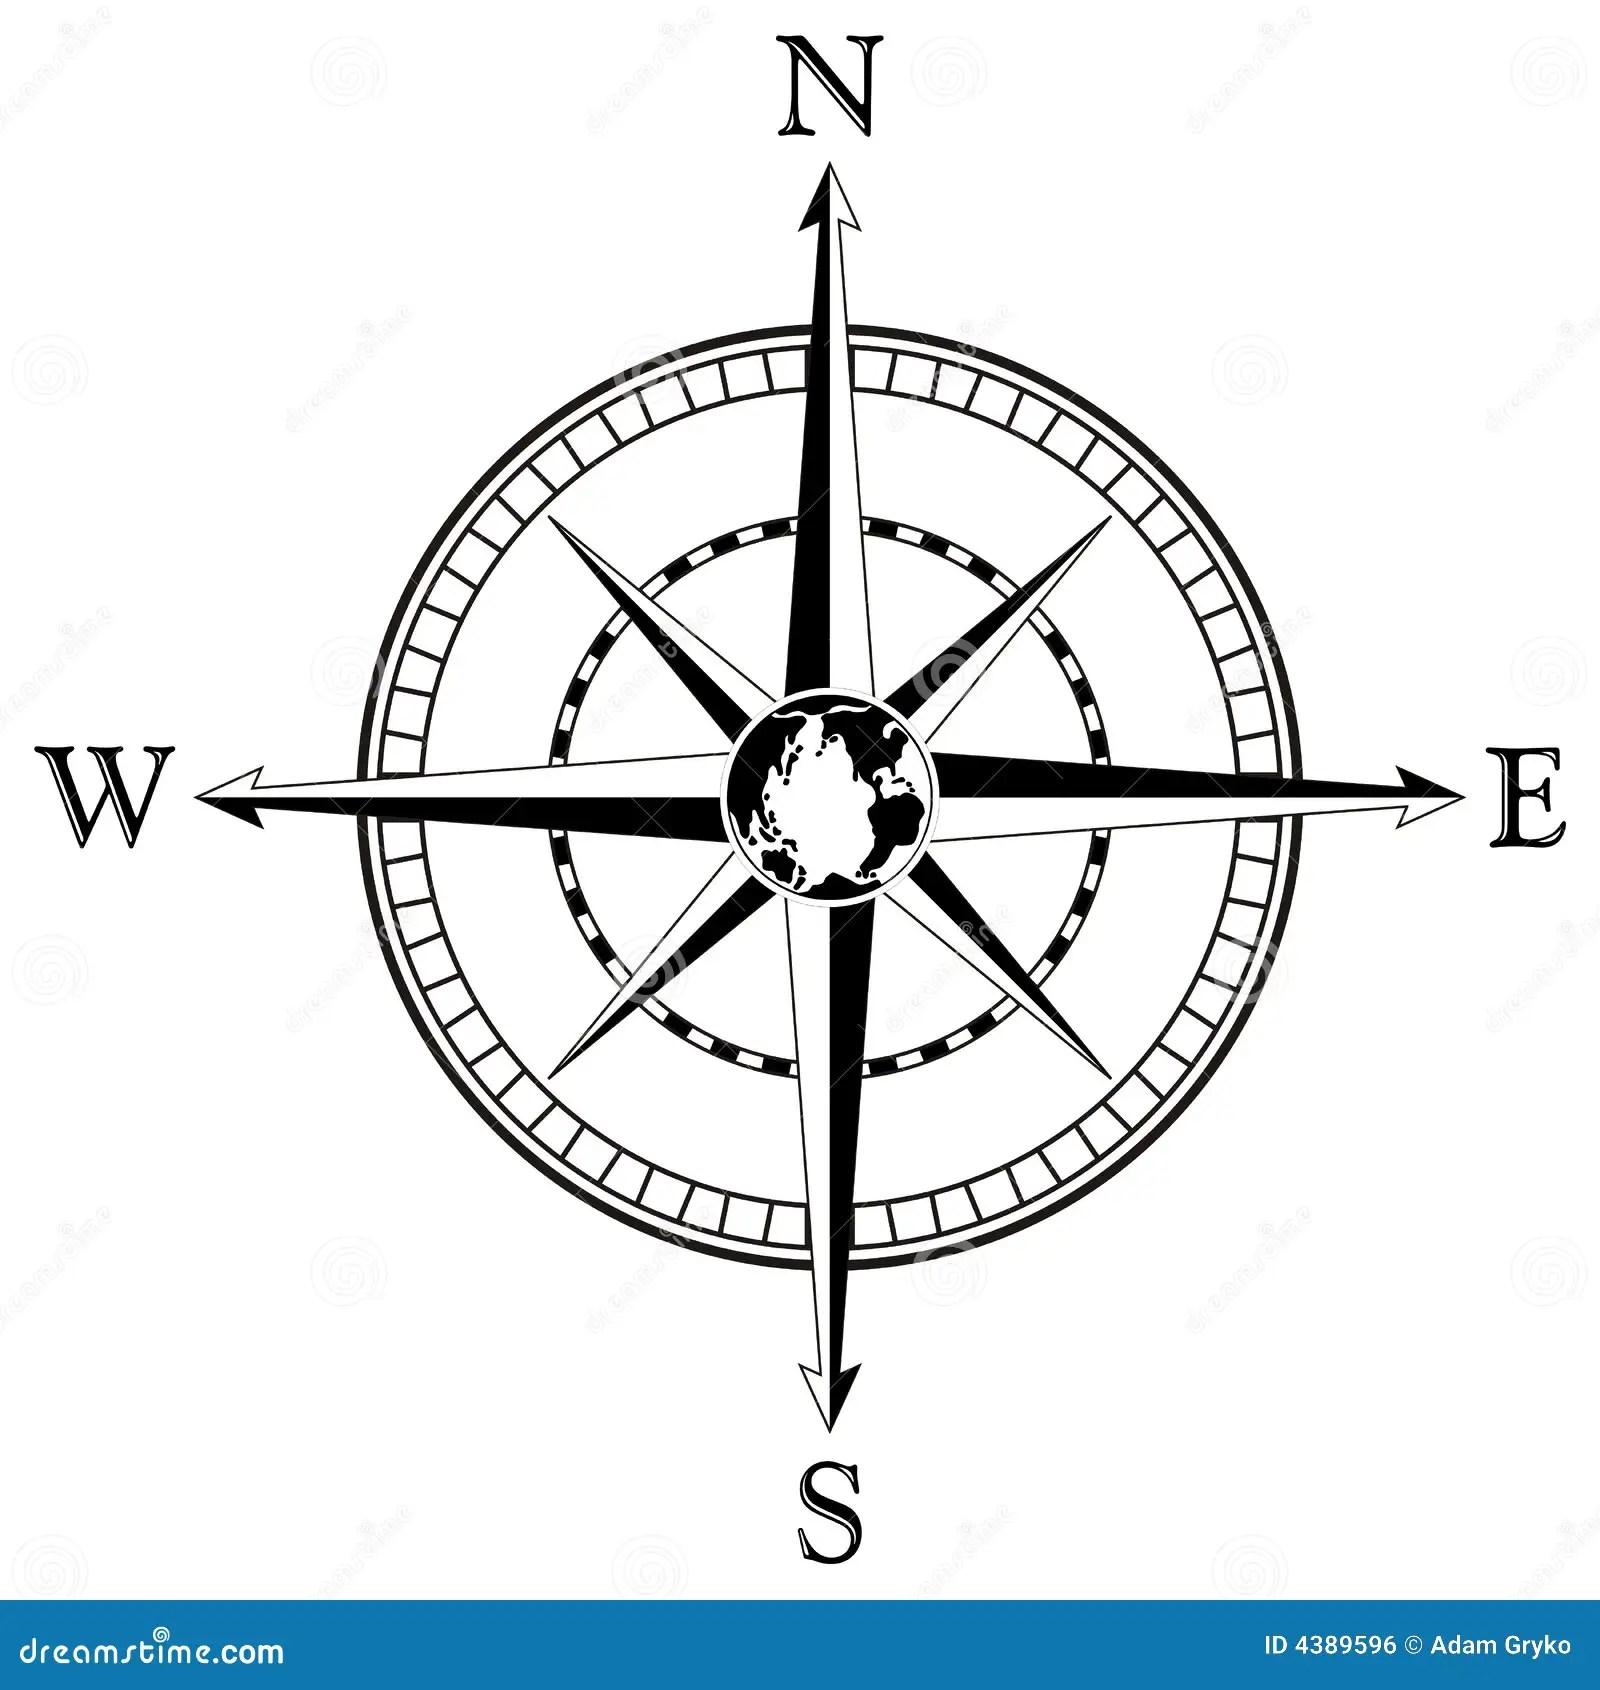 Compass Rose Illustration Stock Vector Illustration Of